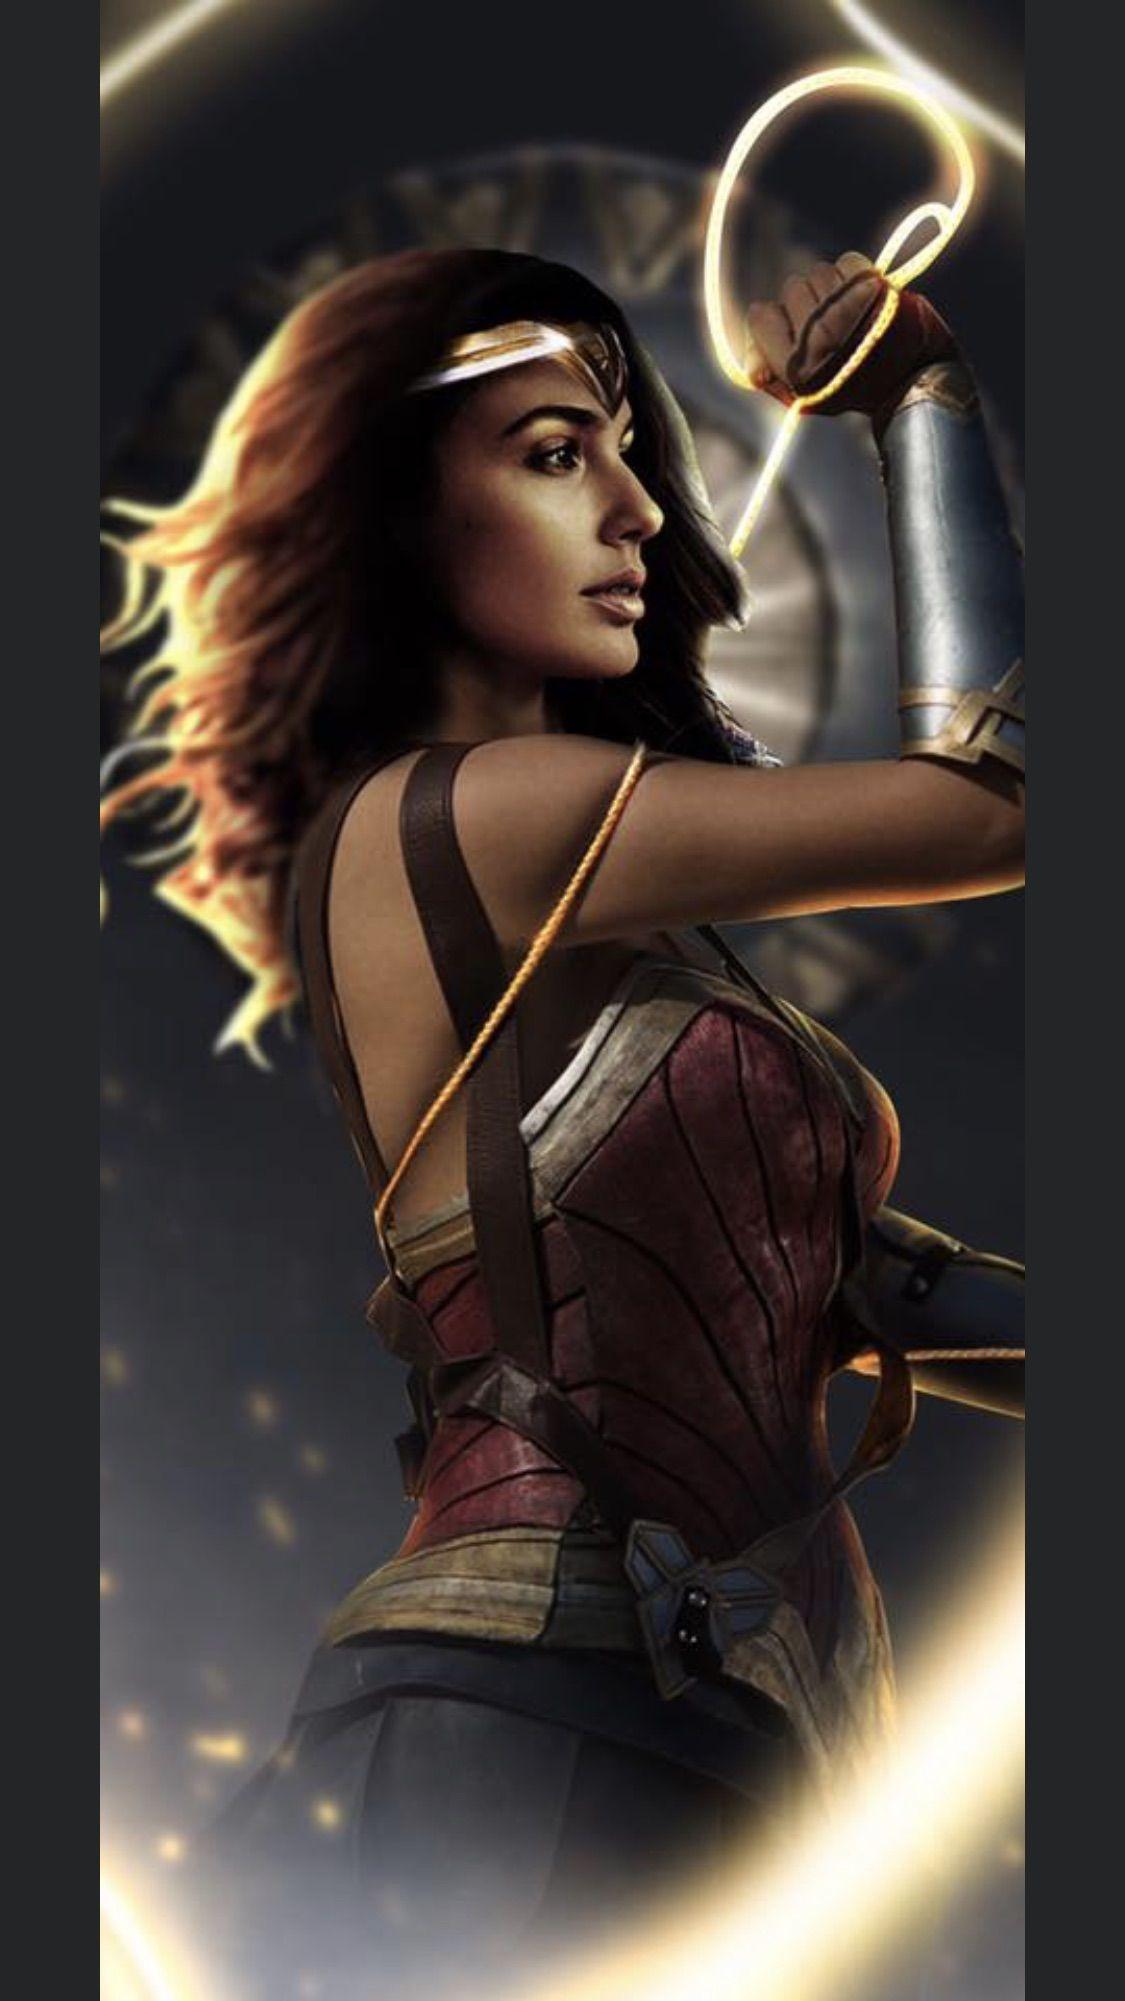 Pin By Cindy Burton On Wonderwoman In 2020 Wonder Woman Pictures Wonder Woman Wonder Woman Logo